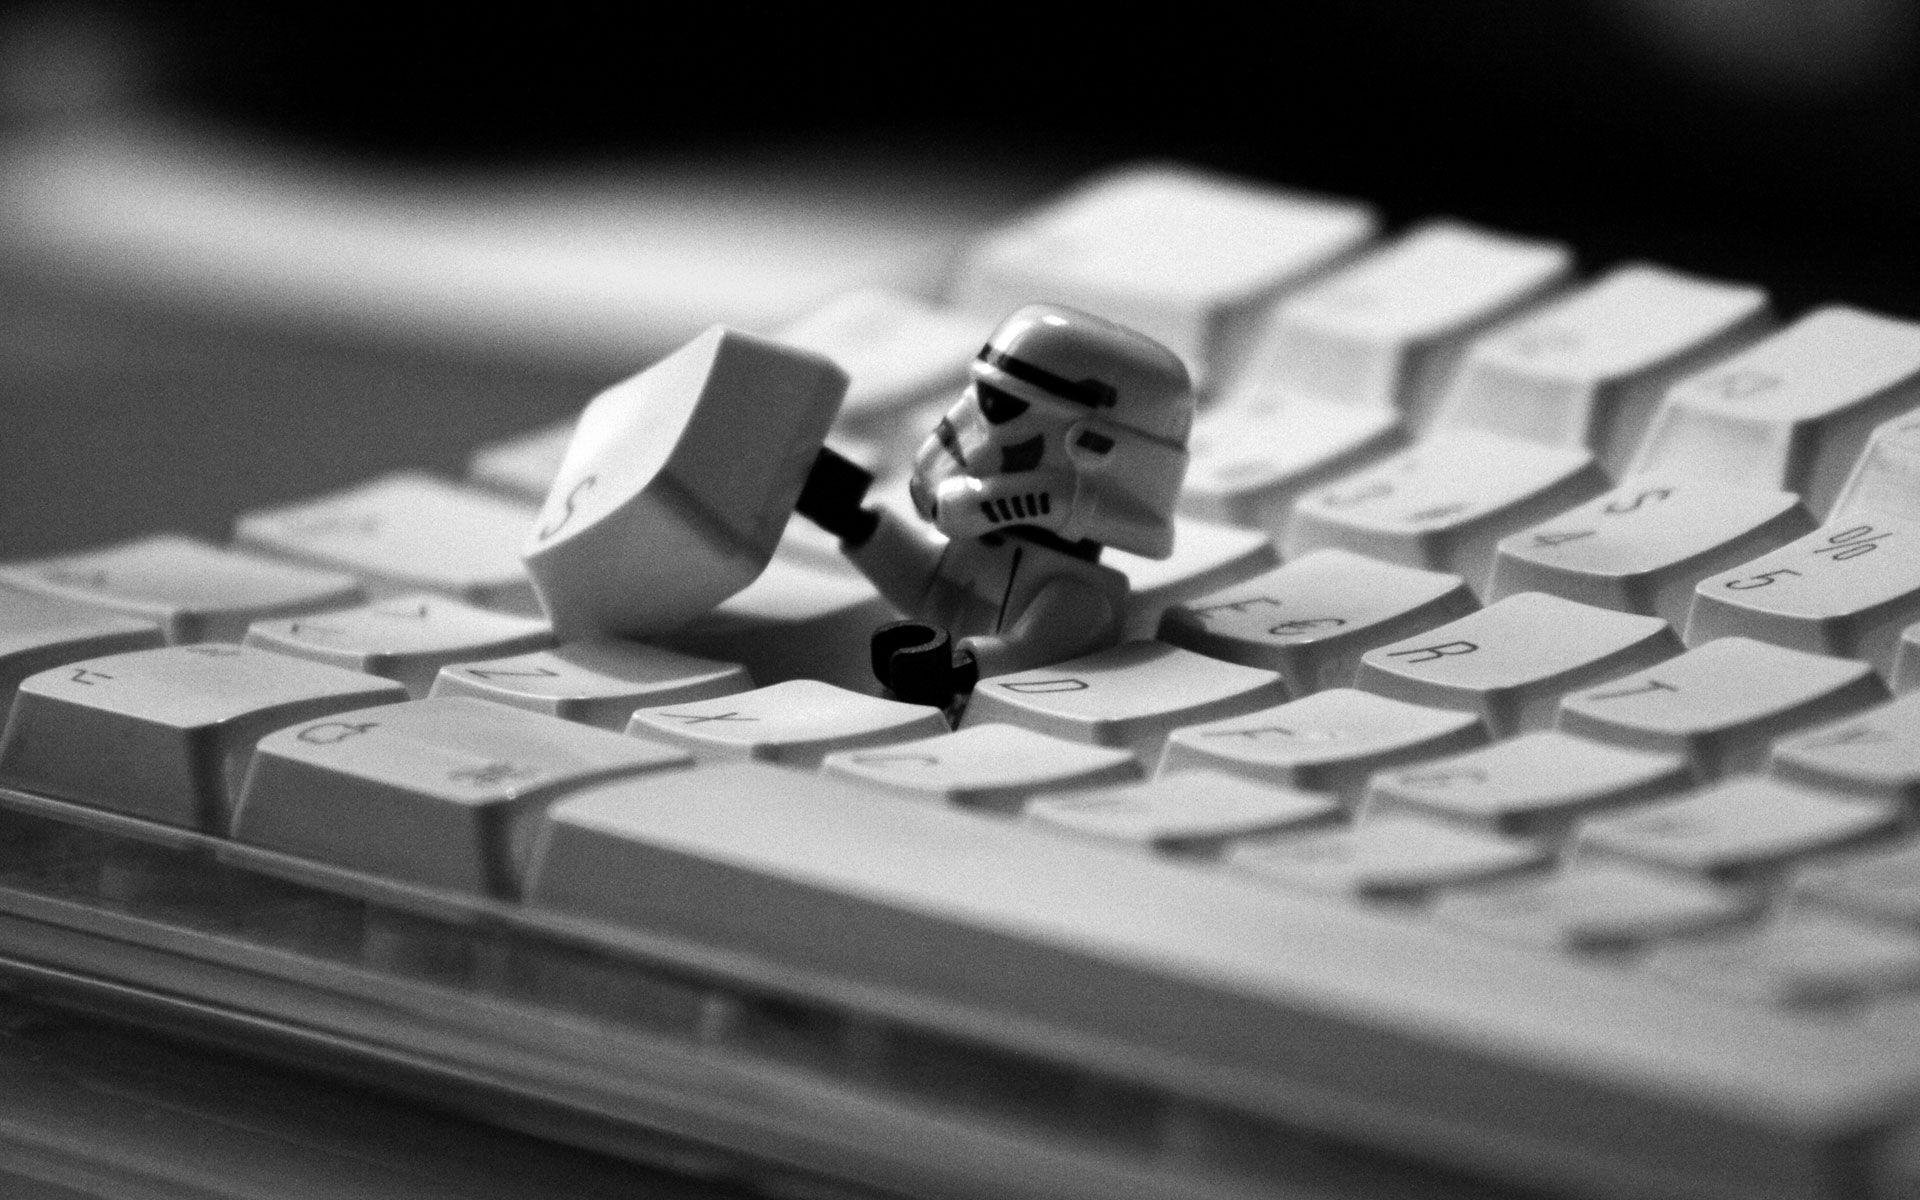 Funny Star Wars Wallpaper Star Wars Comedy Starwars Lego Star Wars Lego Stormtrooper Star Wars